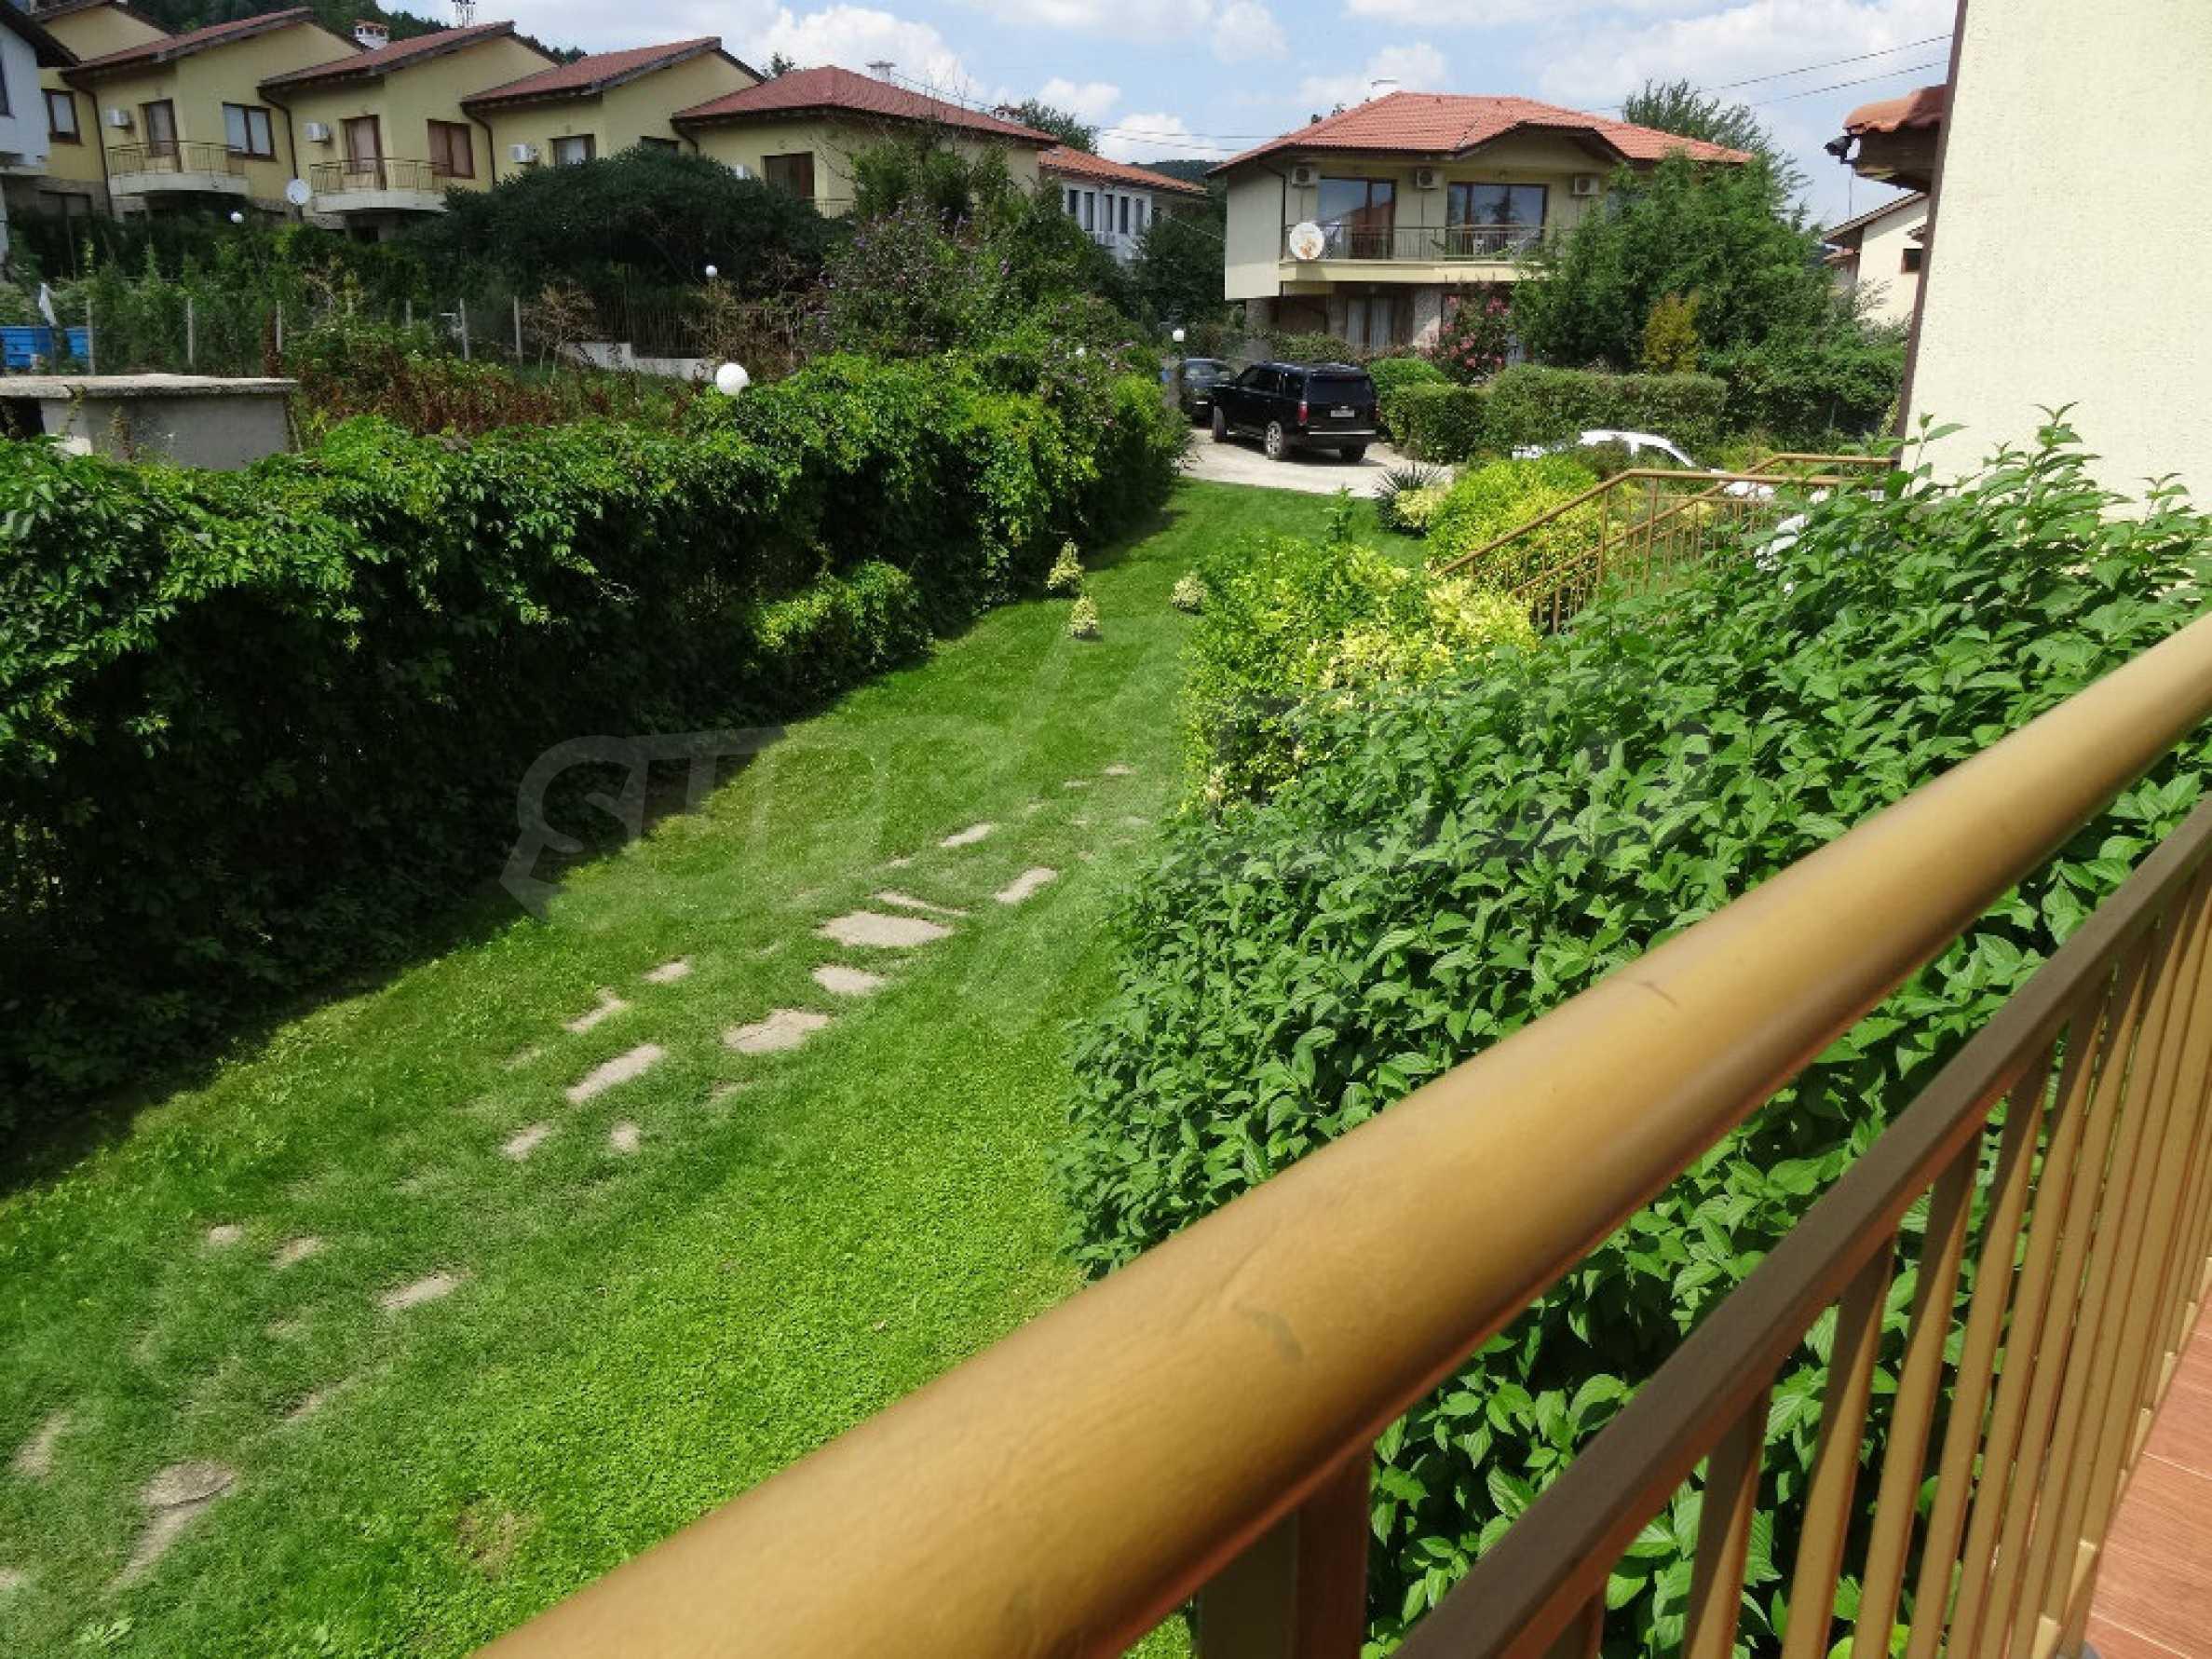 Тристаен апартамент до ключ близо до курорти Албена и Кранево 10